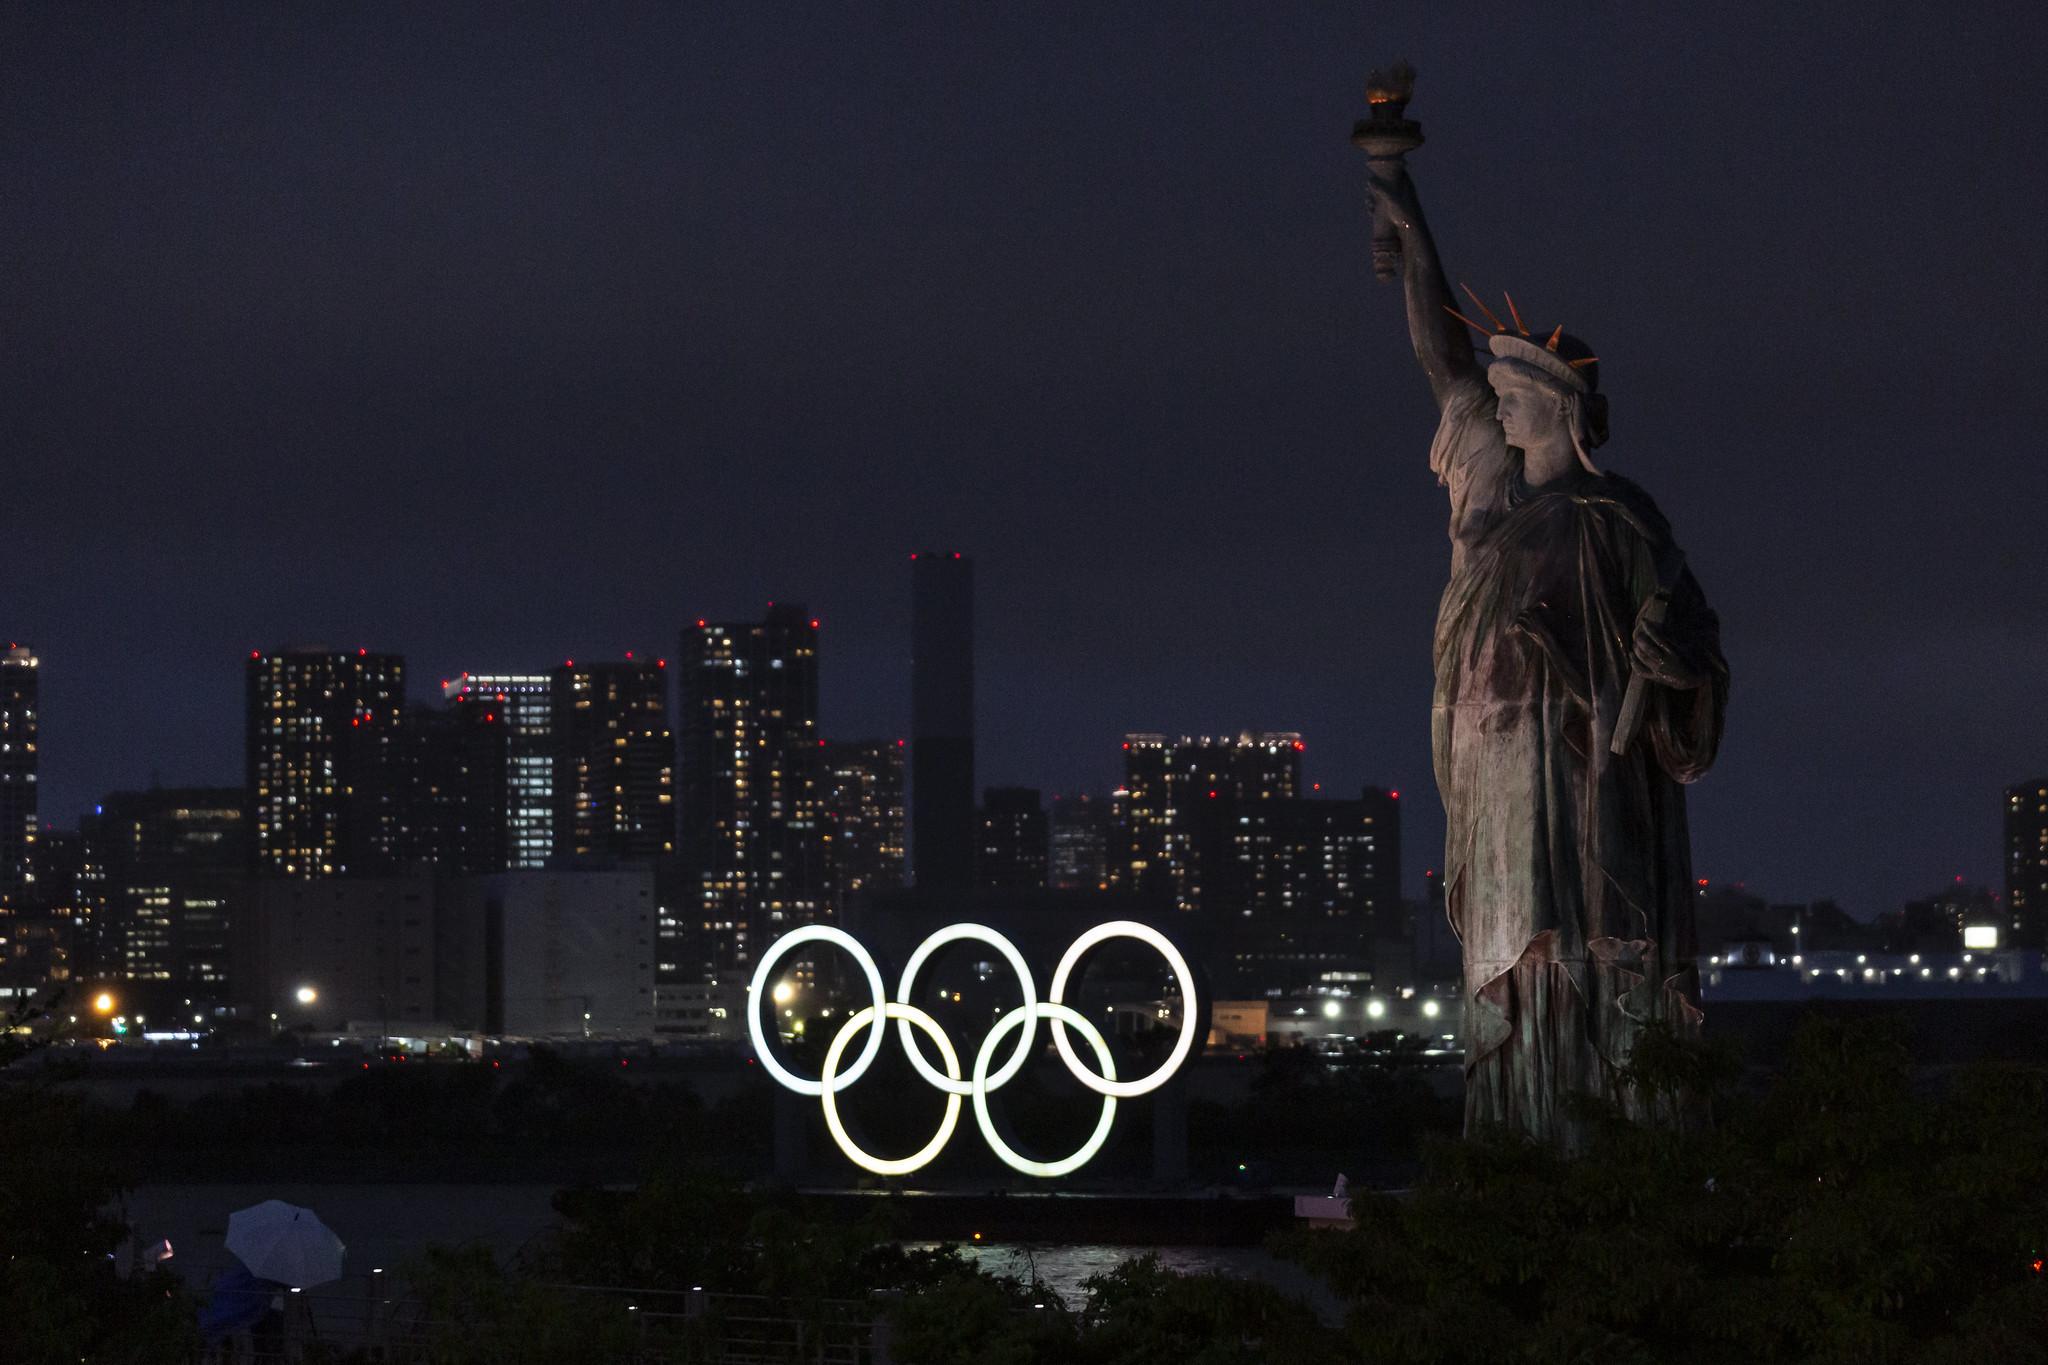 Tokyo 2020 and Rule 50 set to headline IOC Executive Board meeting